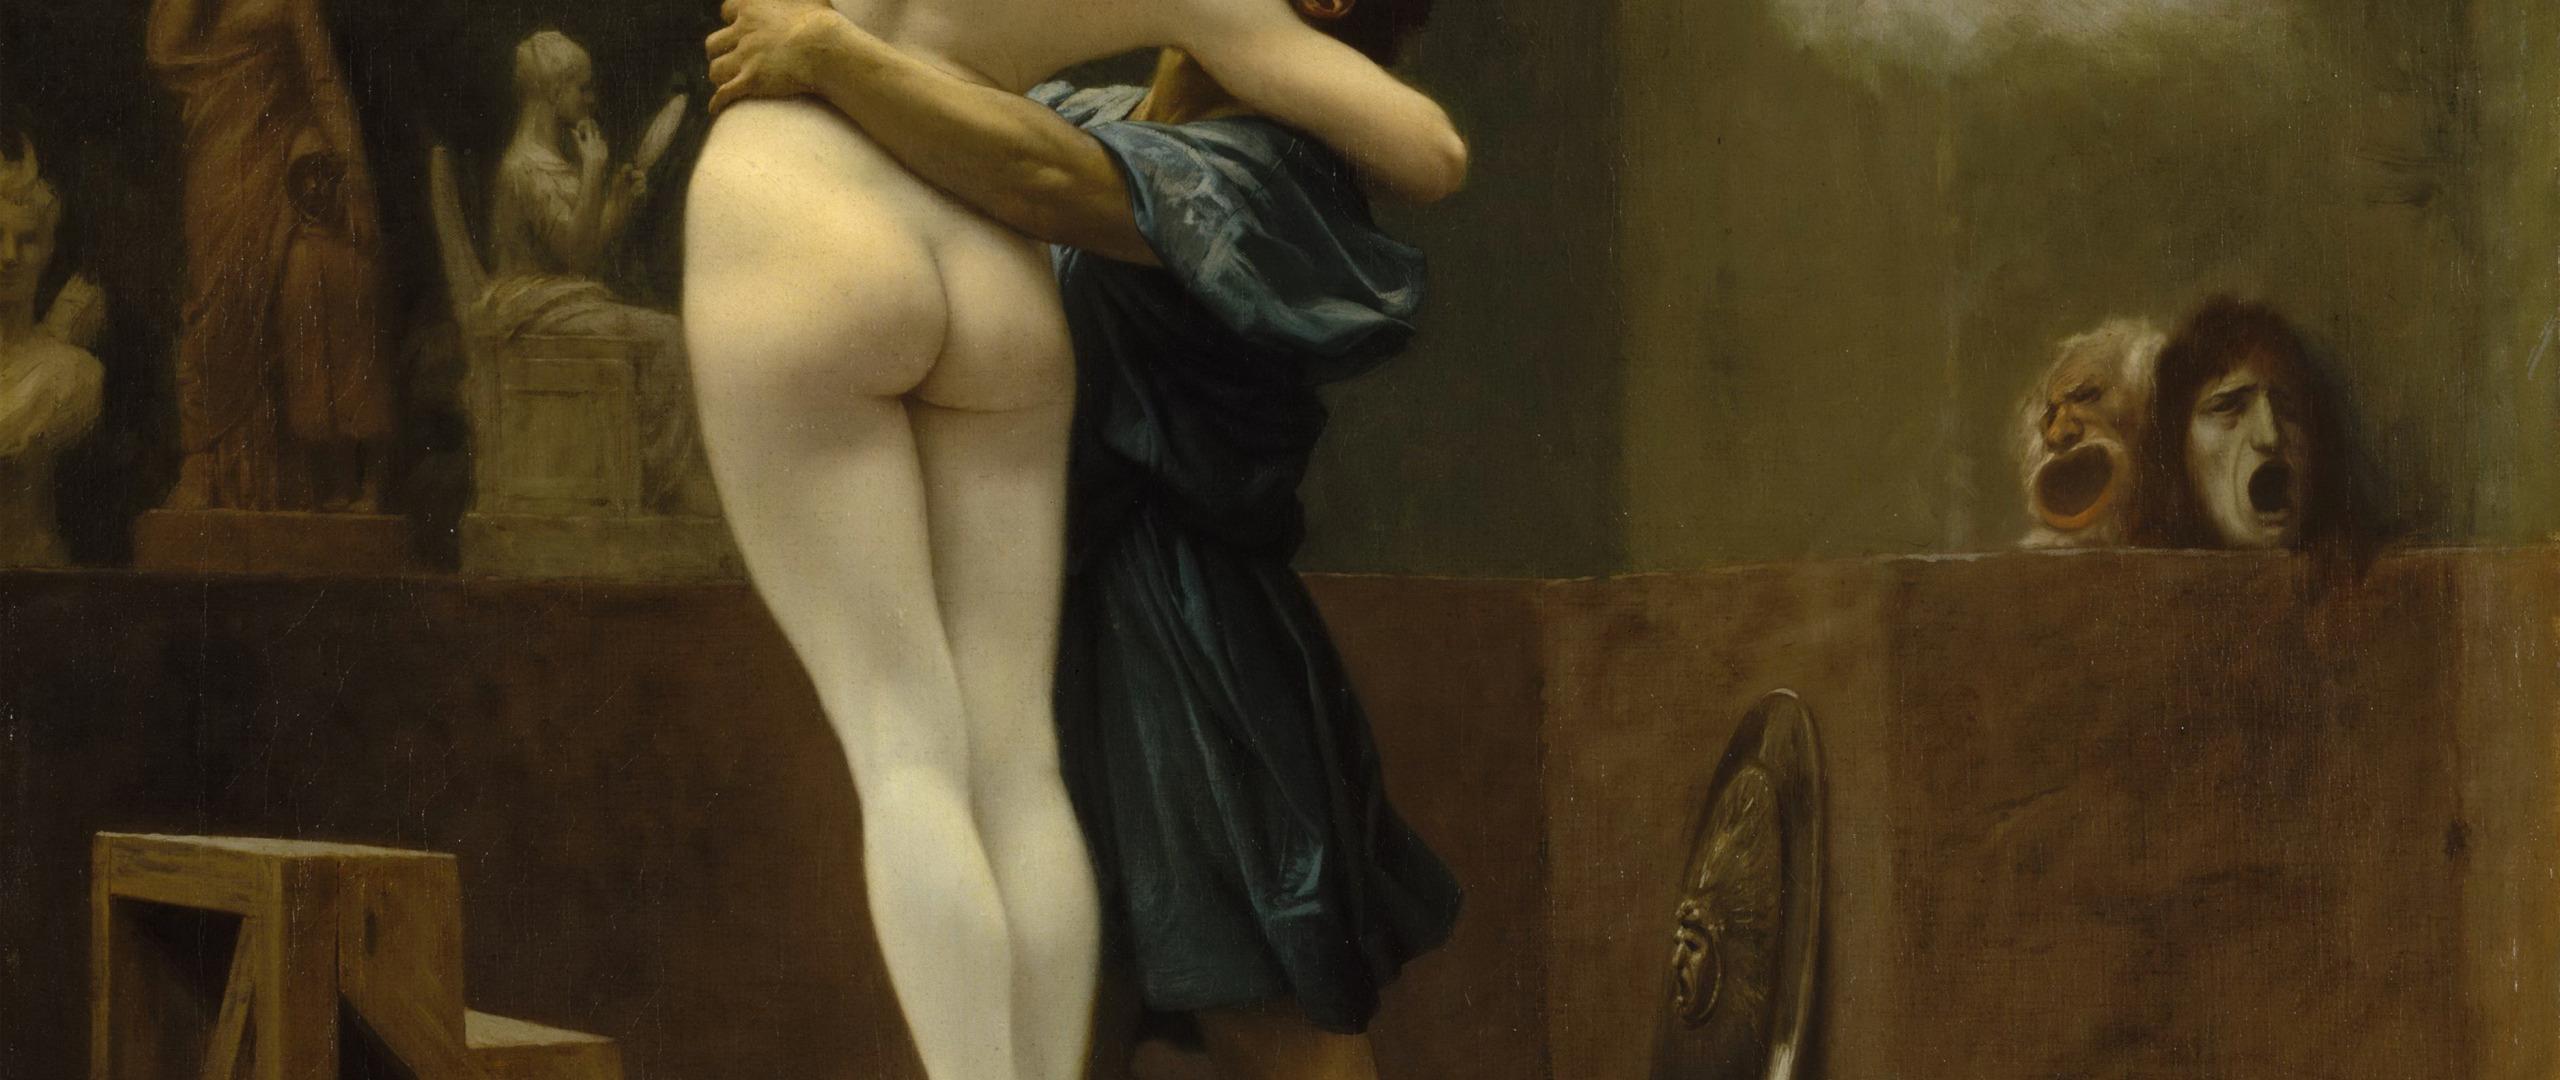 an analysis of jean lon grmes painting pygmalion and galatea